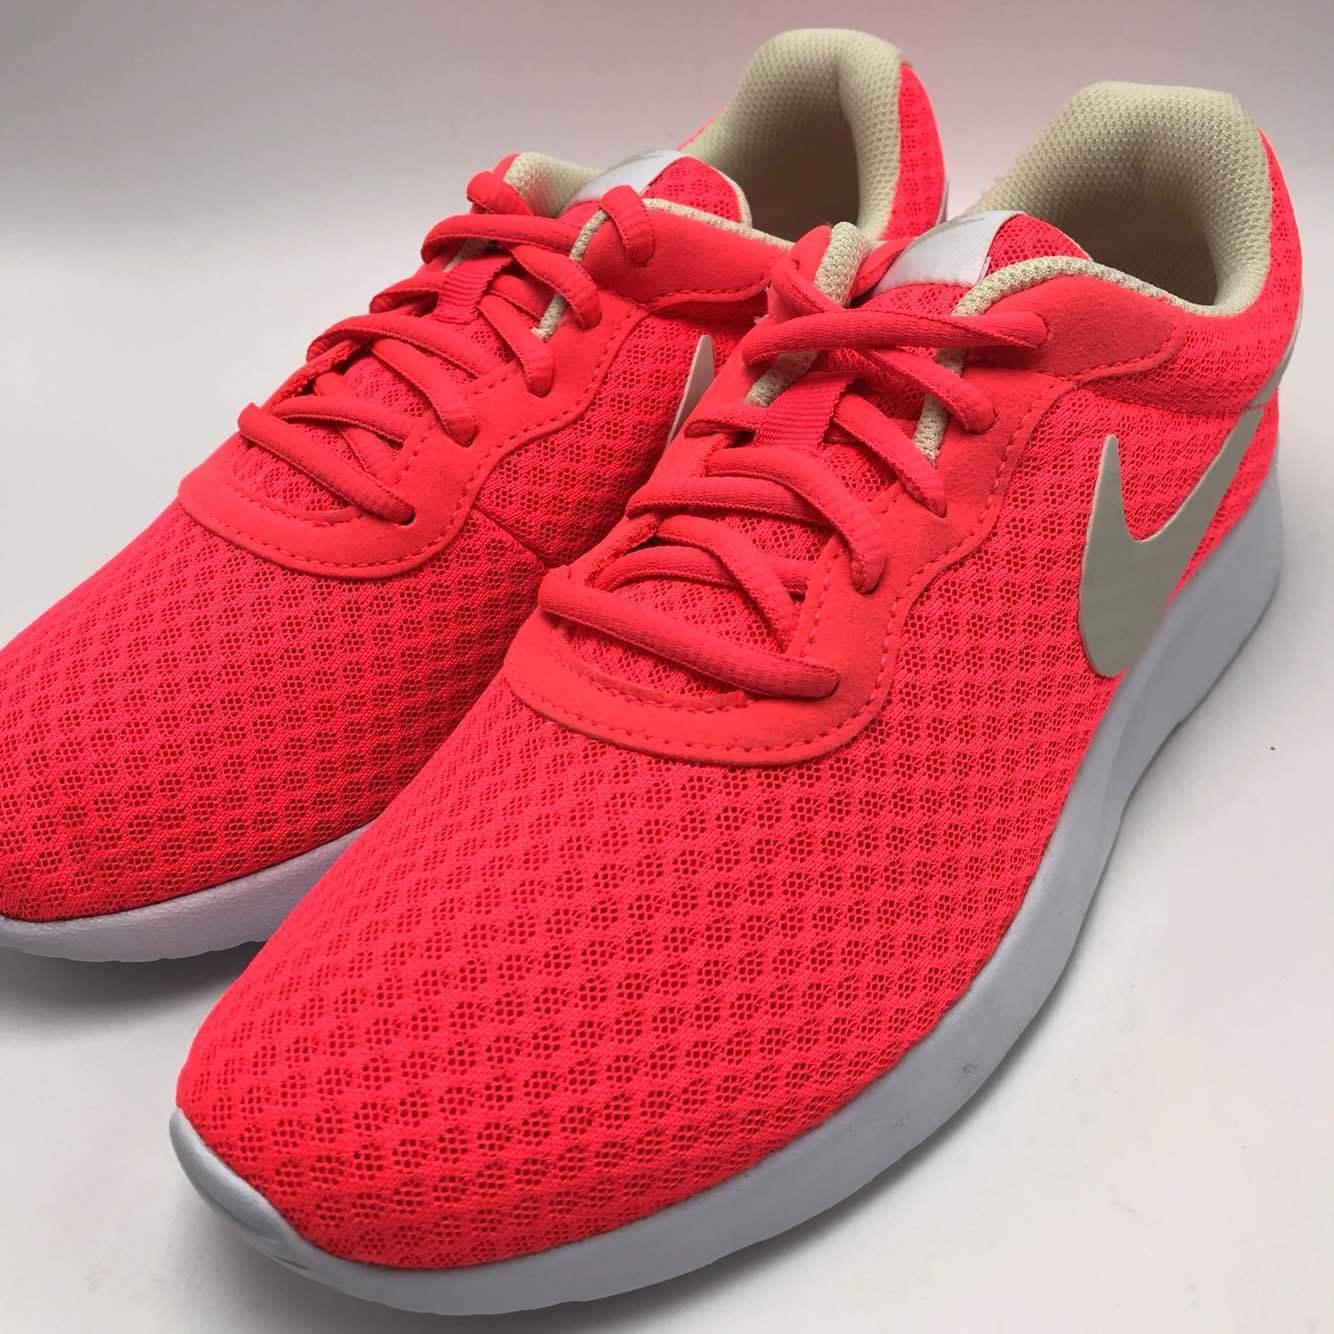 Nike Tanjun Women's Running Shoes Solar Red/LT Orewood BRN-White 812655-602